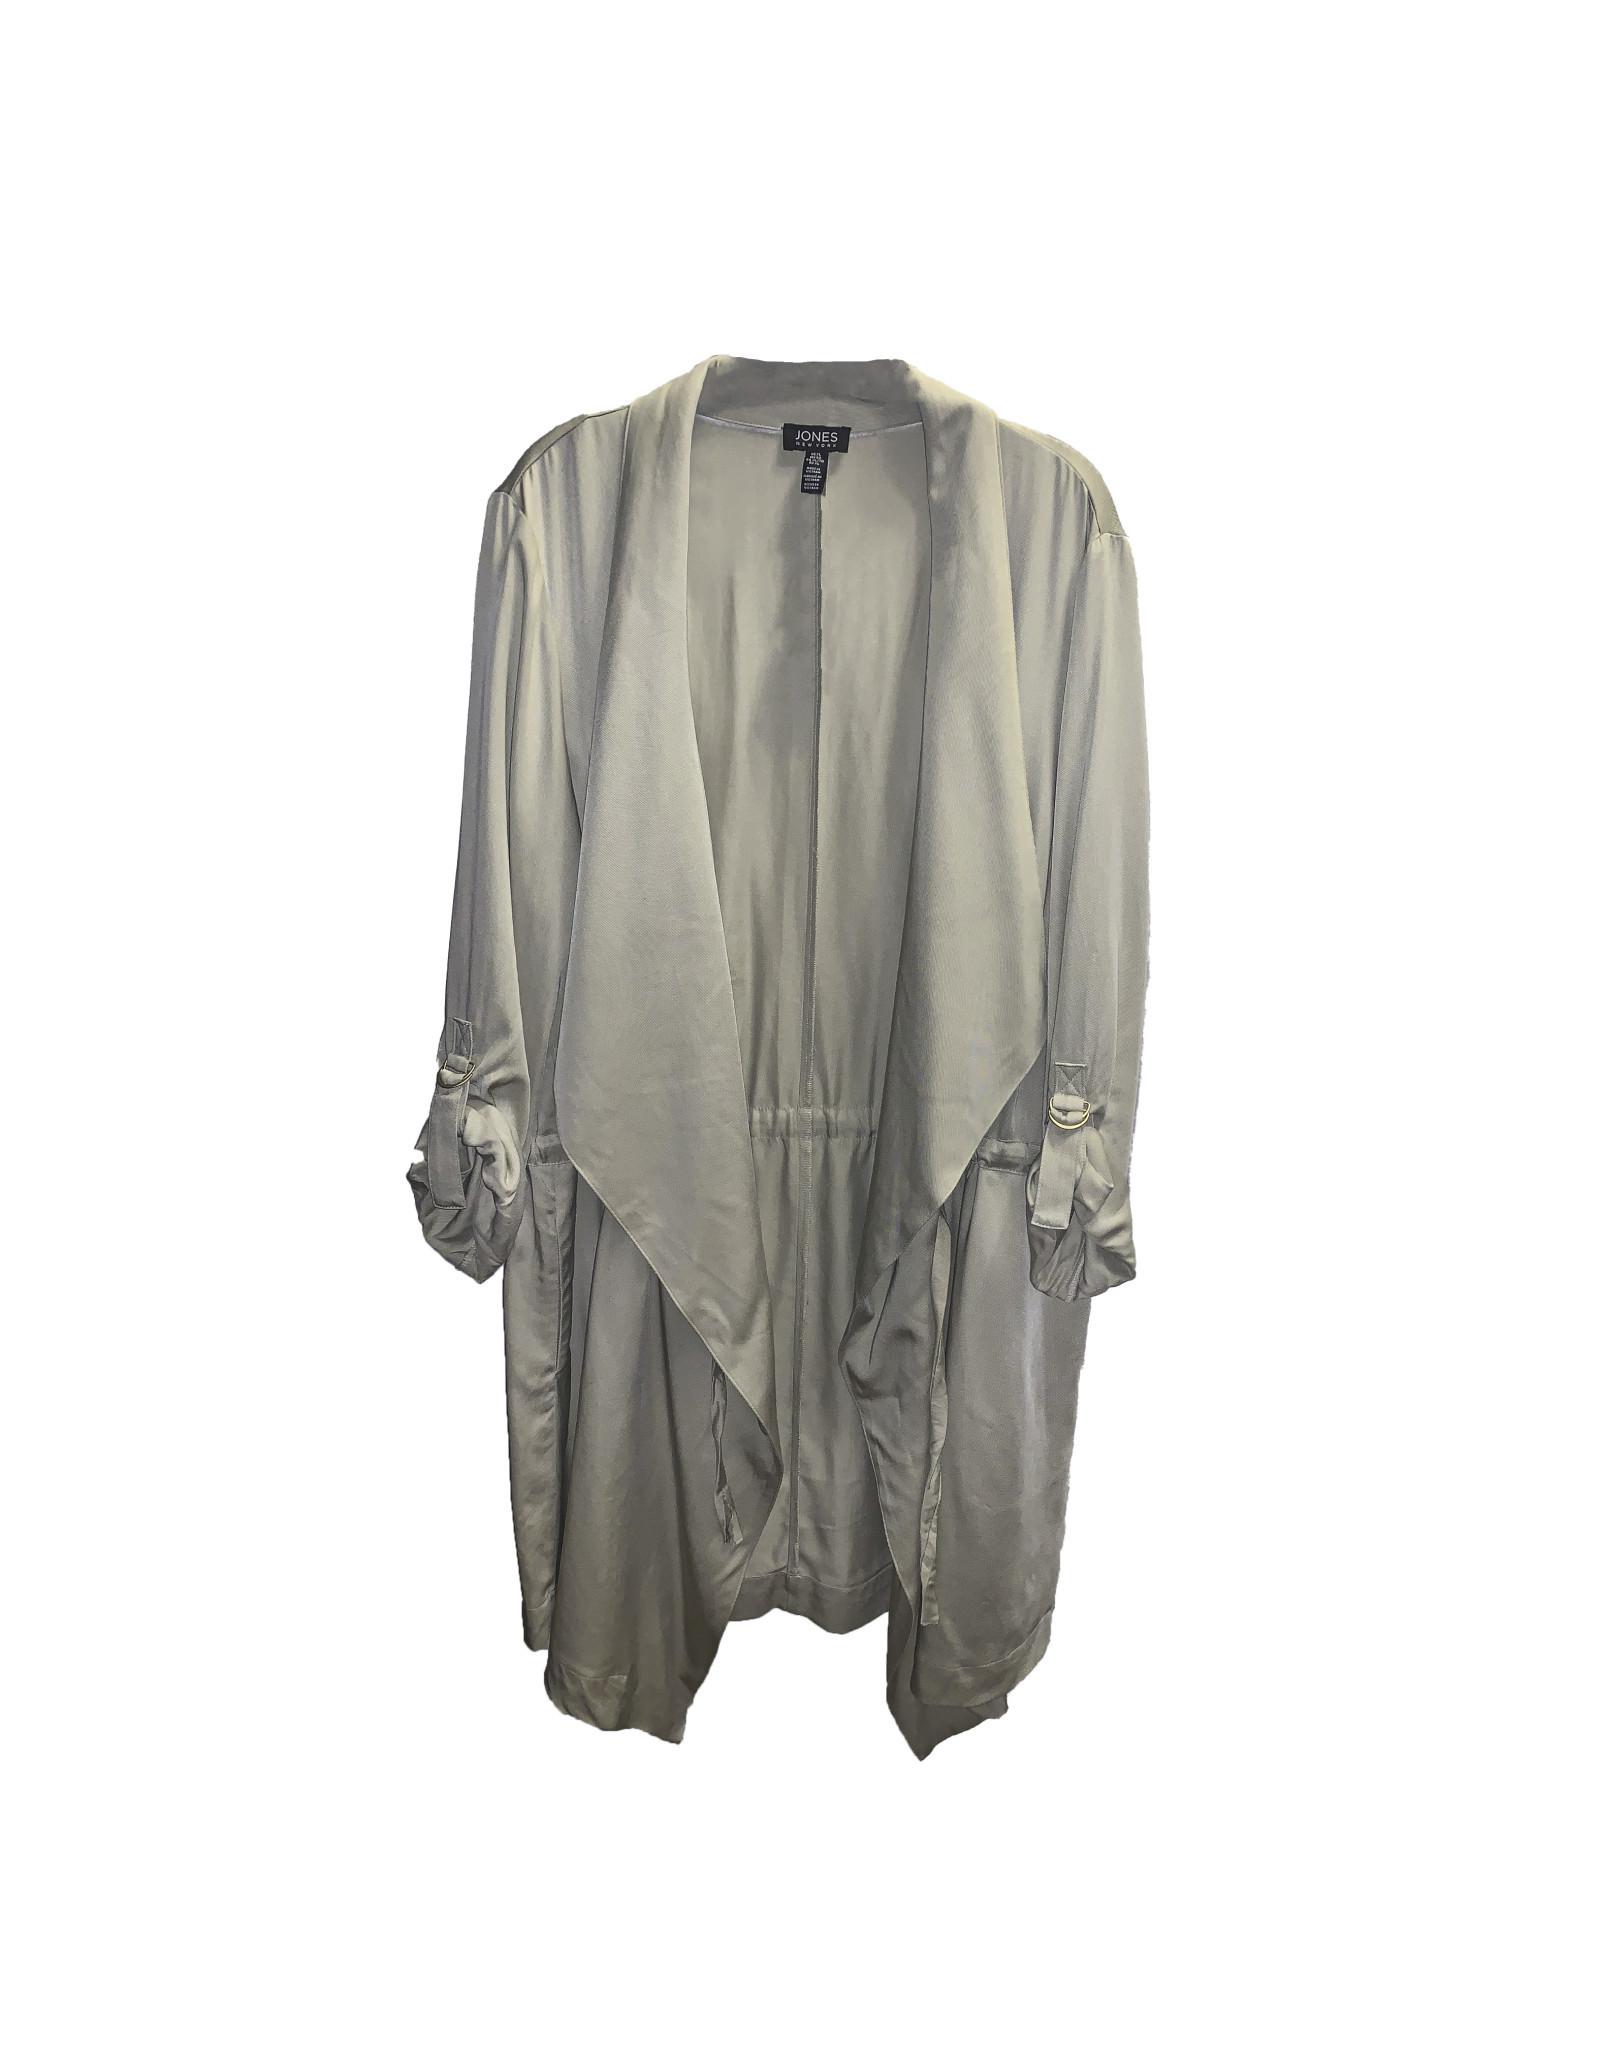 Jones New York JONES New York  Drapery  Open Jacket  Size XL